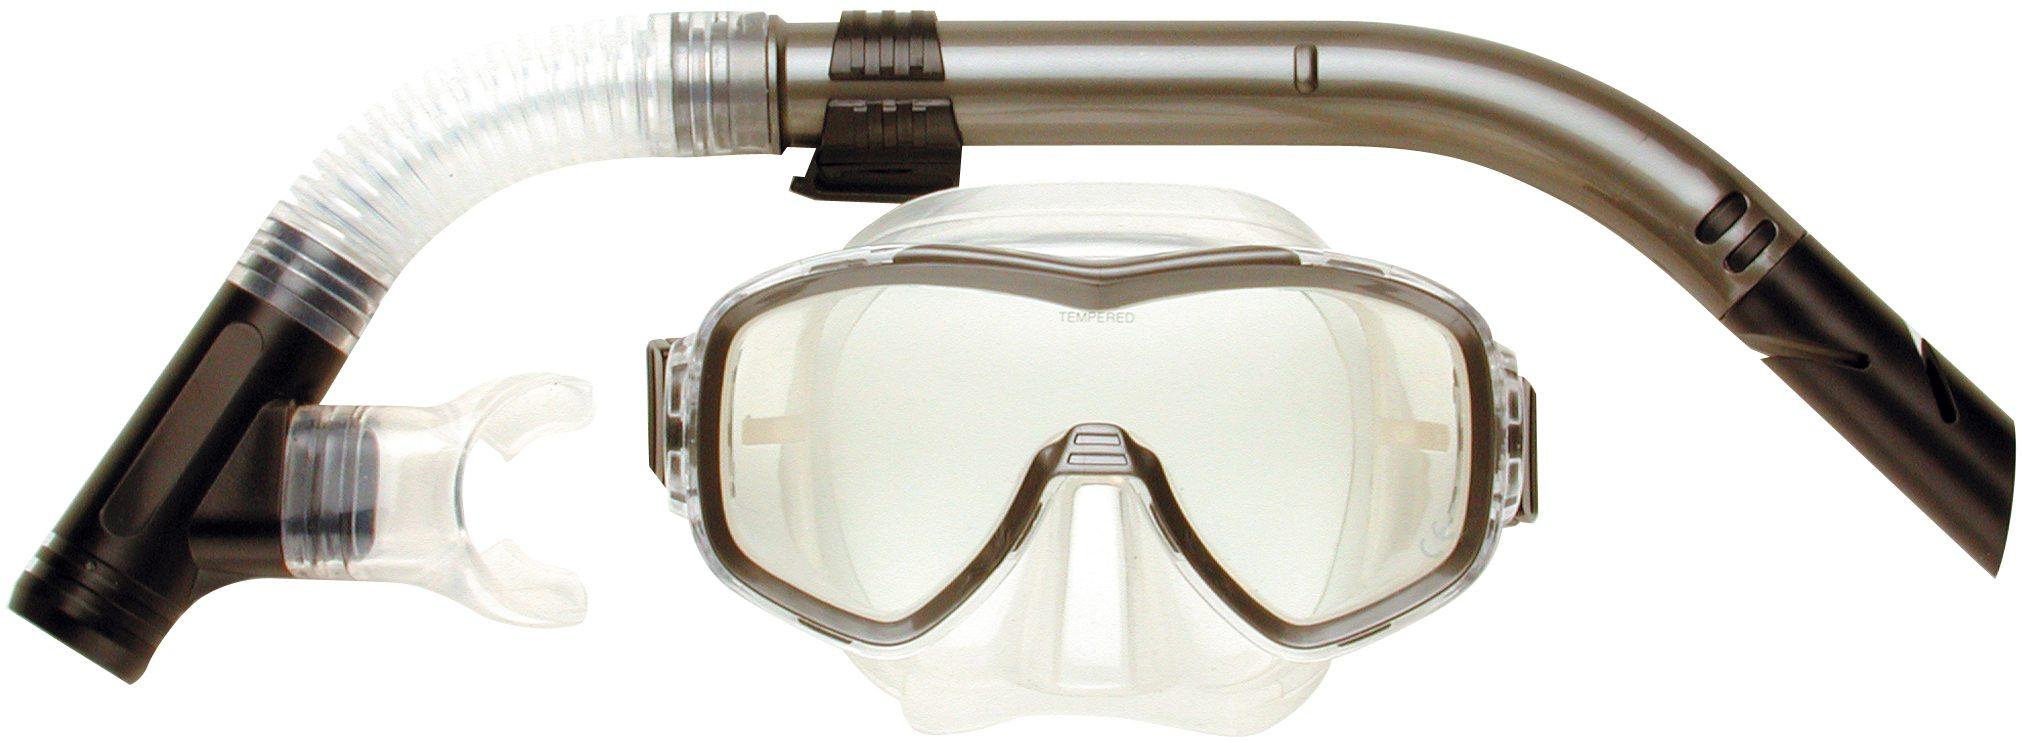 Snorkeling gear-aristocrat-one-lens-silic-set